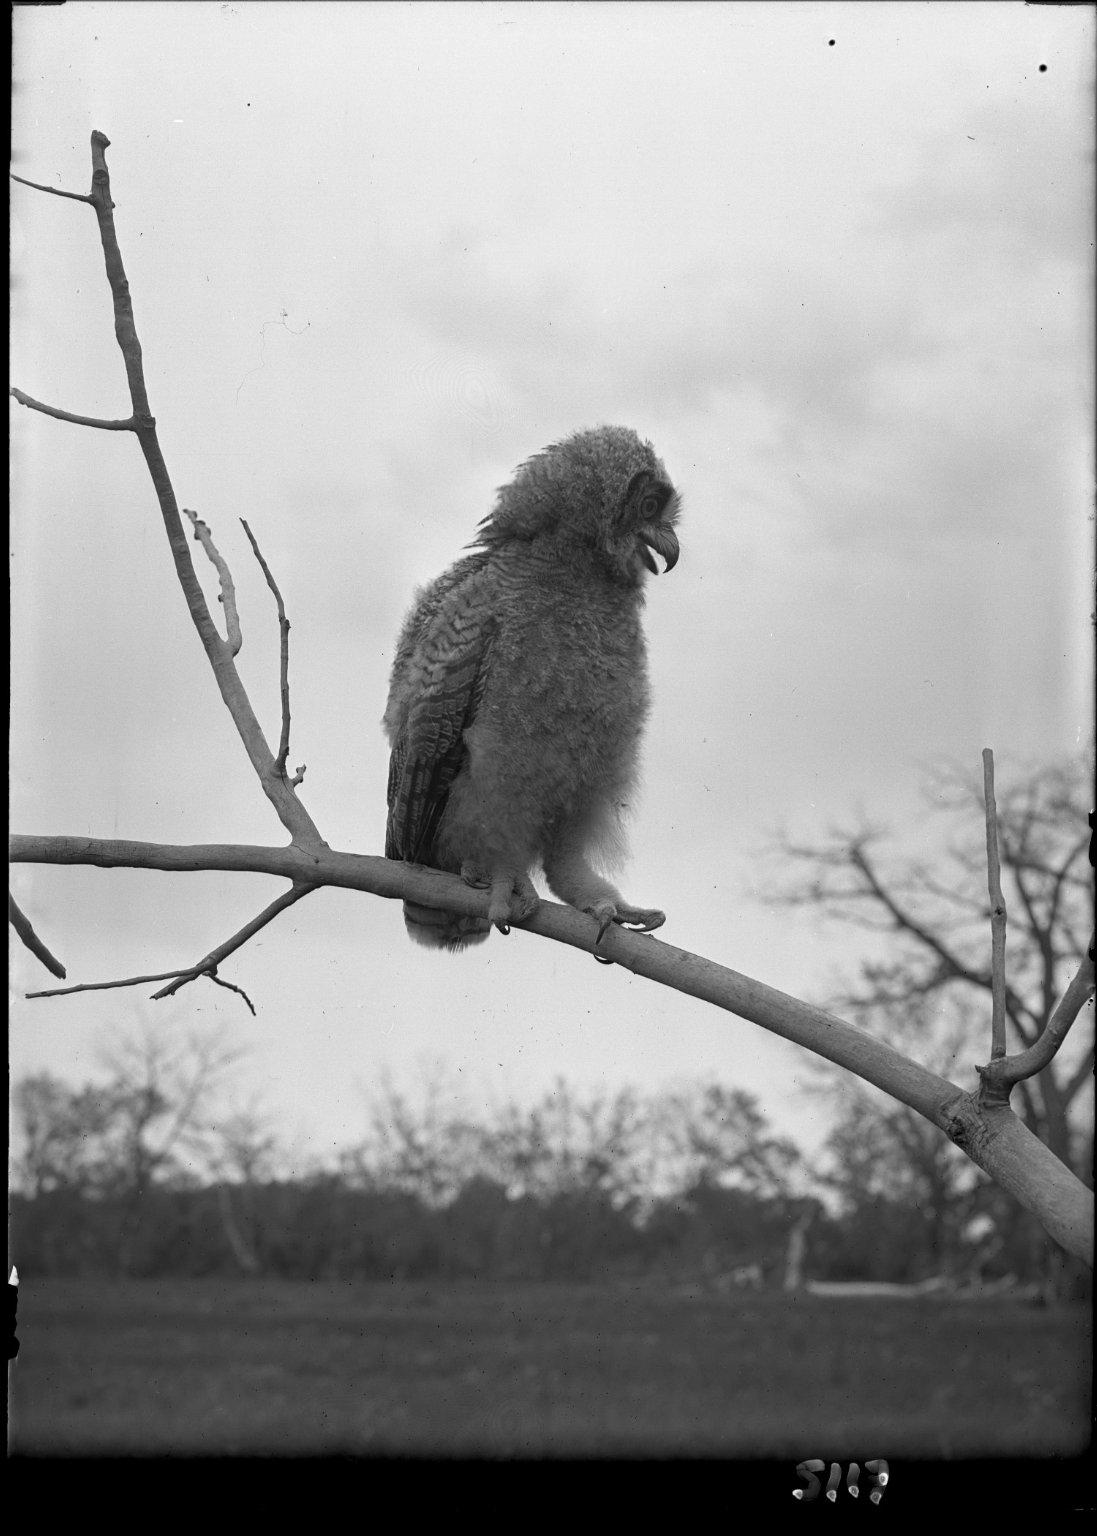 Little Great Horned Owl on log, bill open